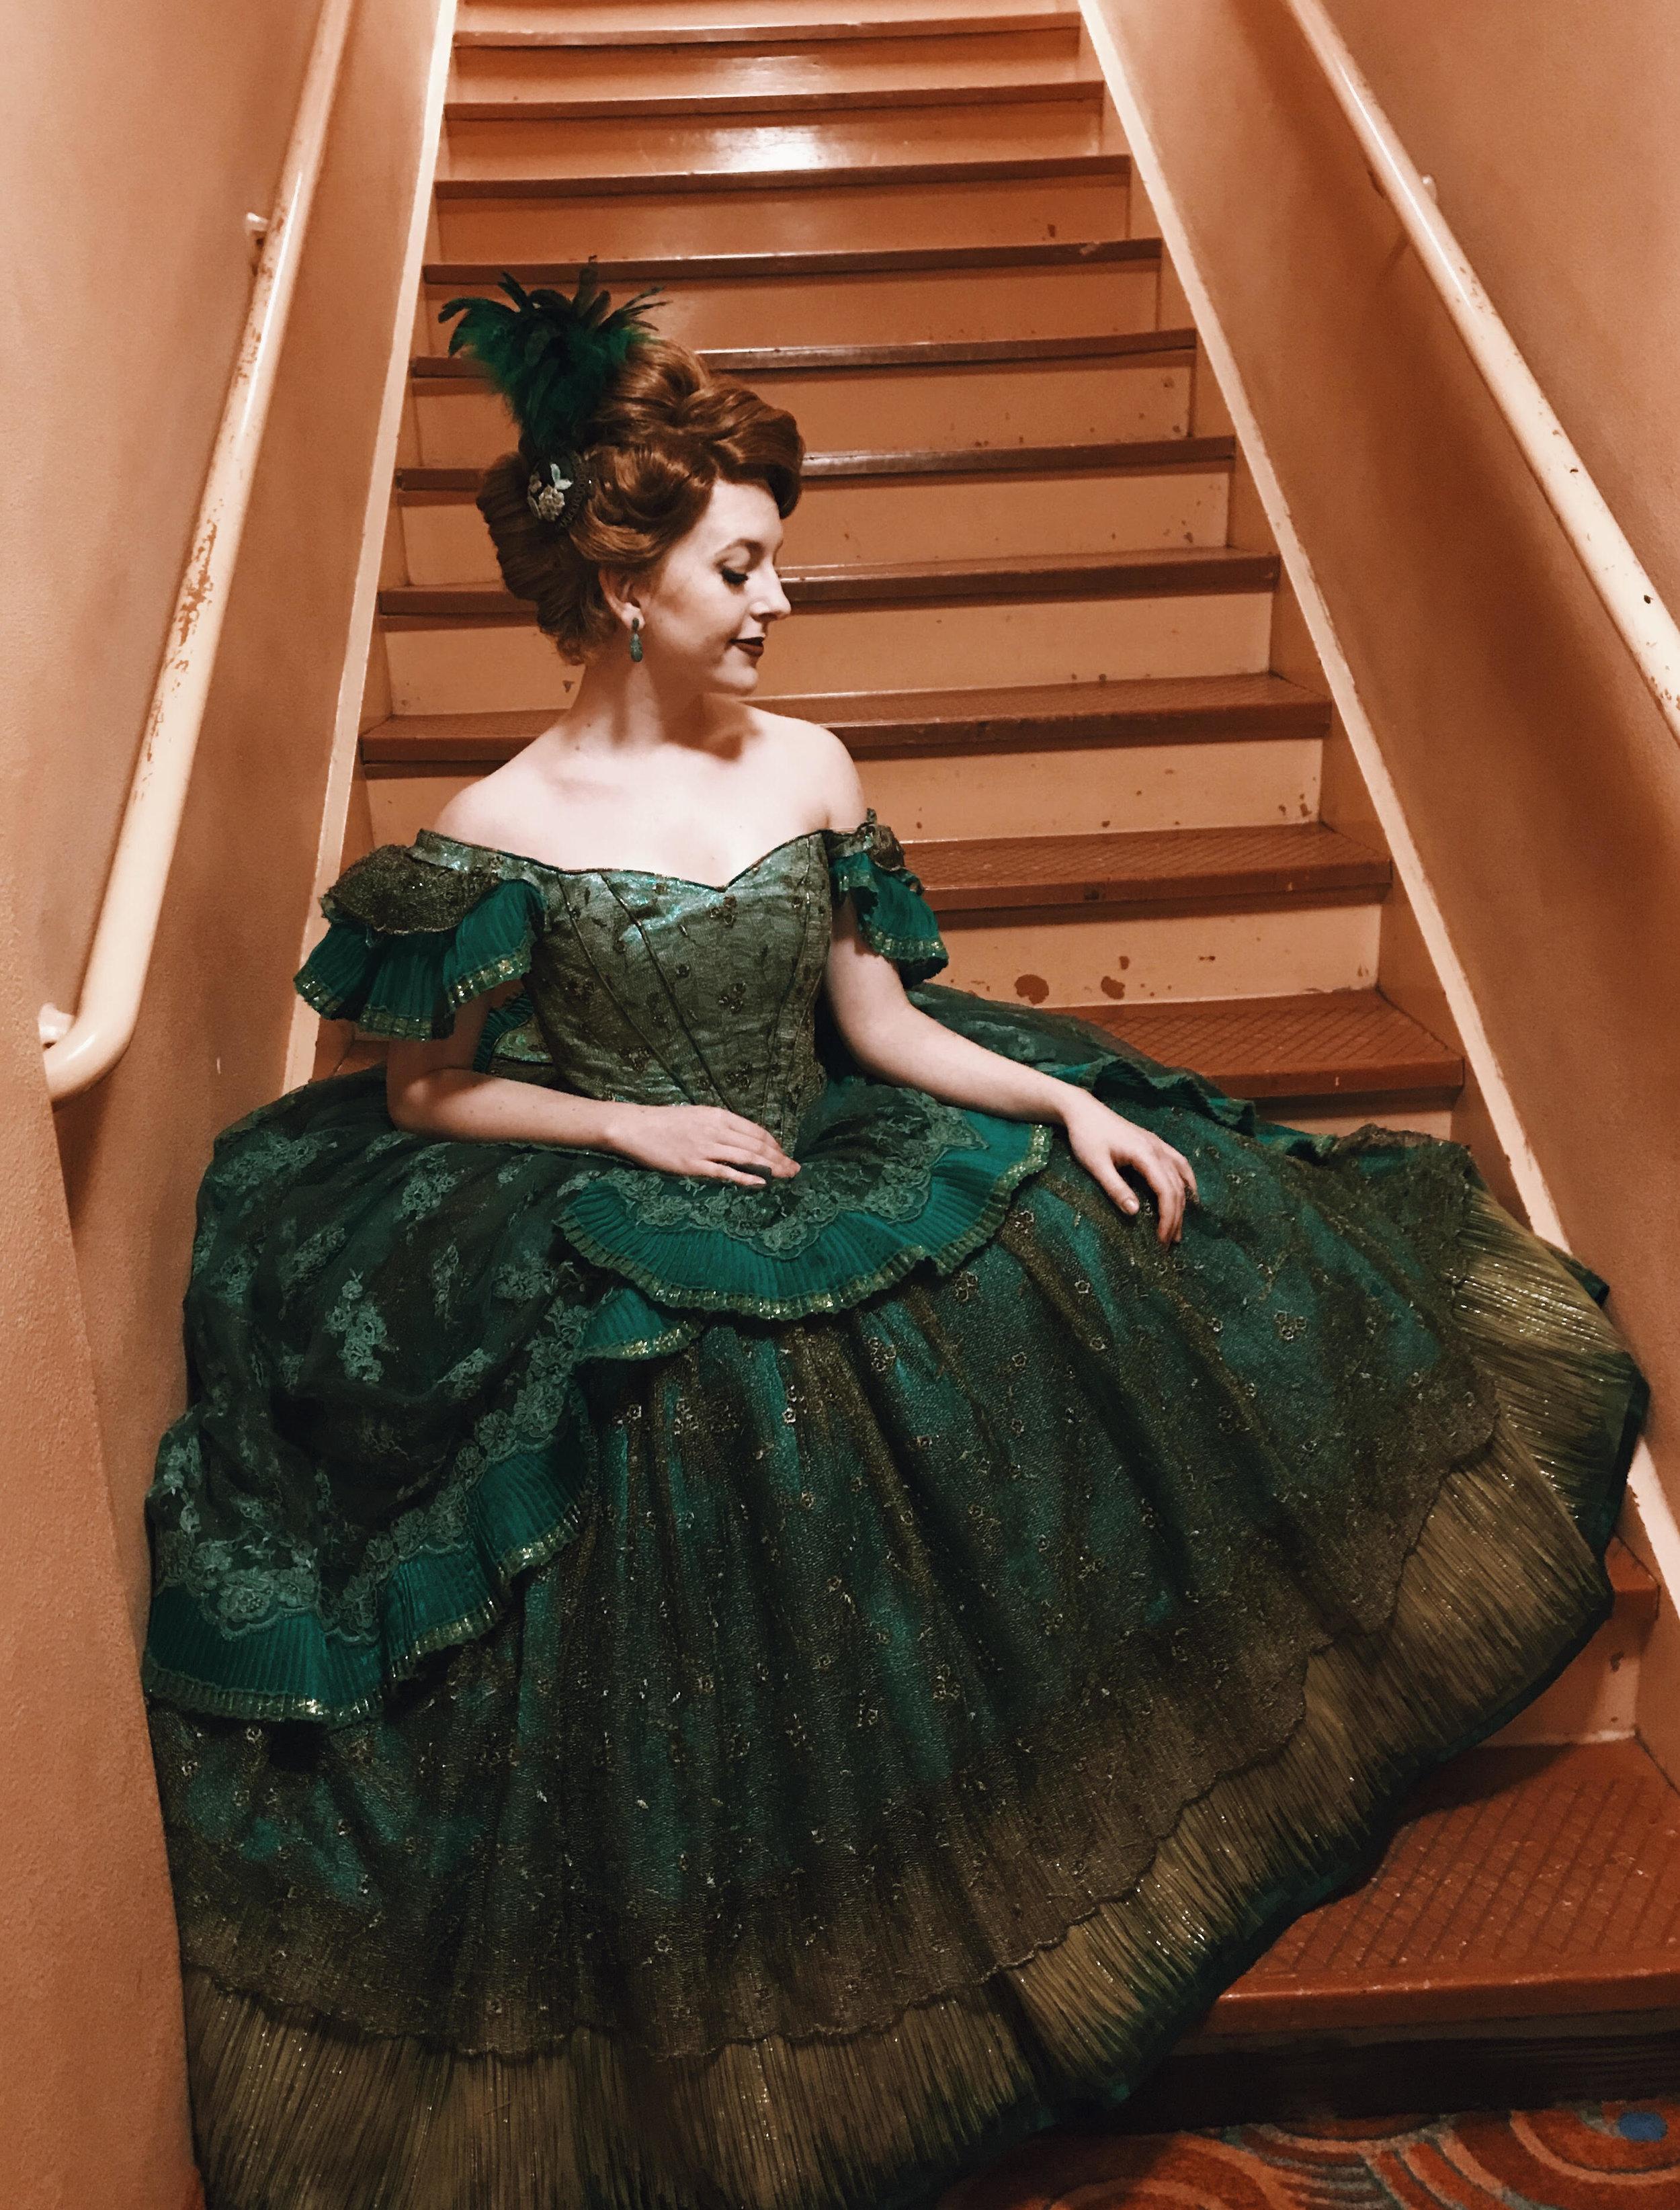 green dress pic.jpg